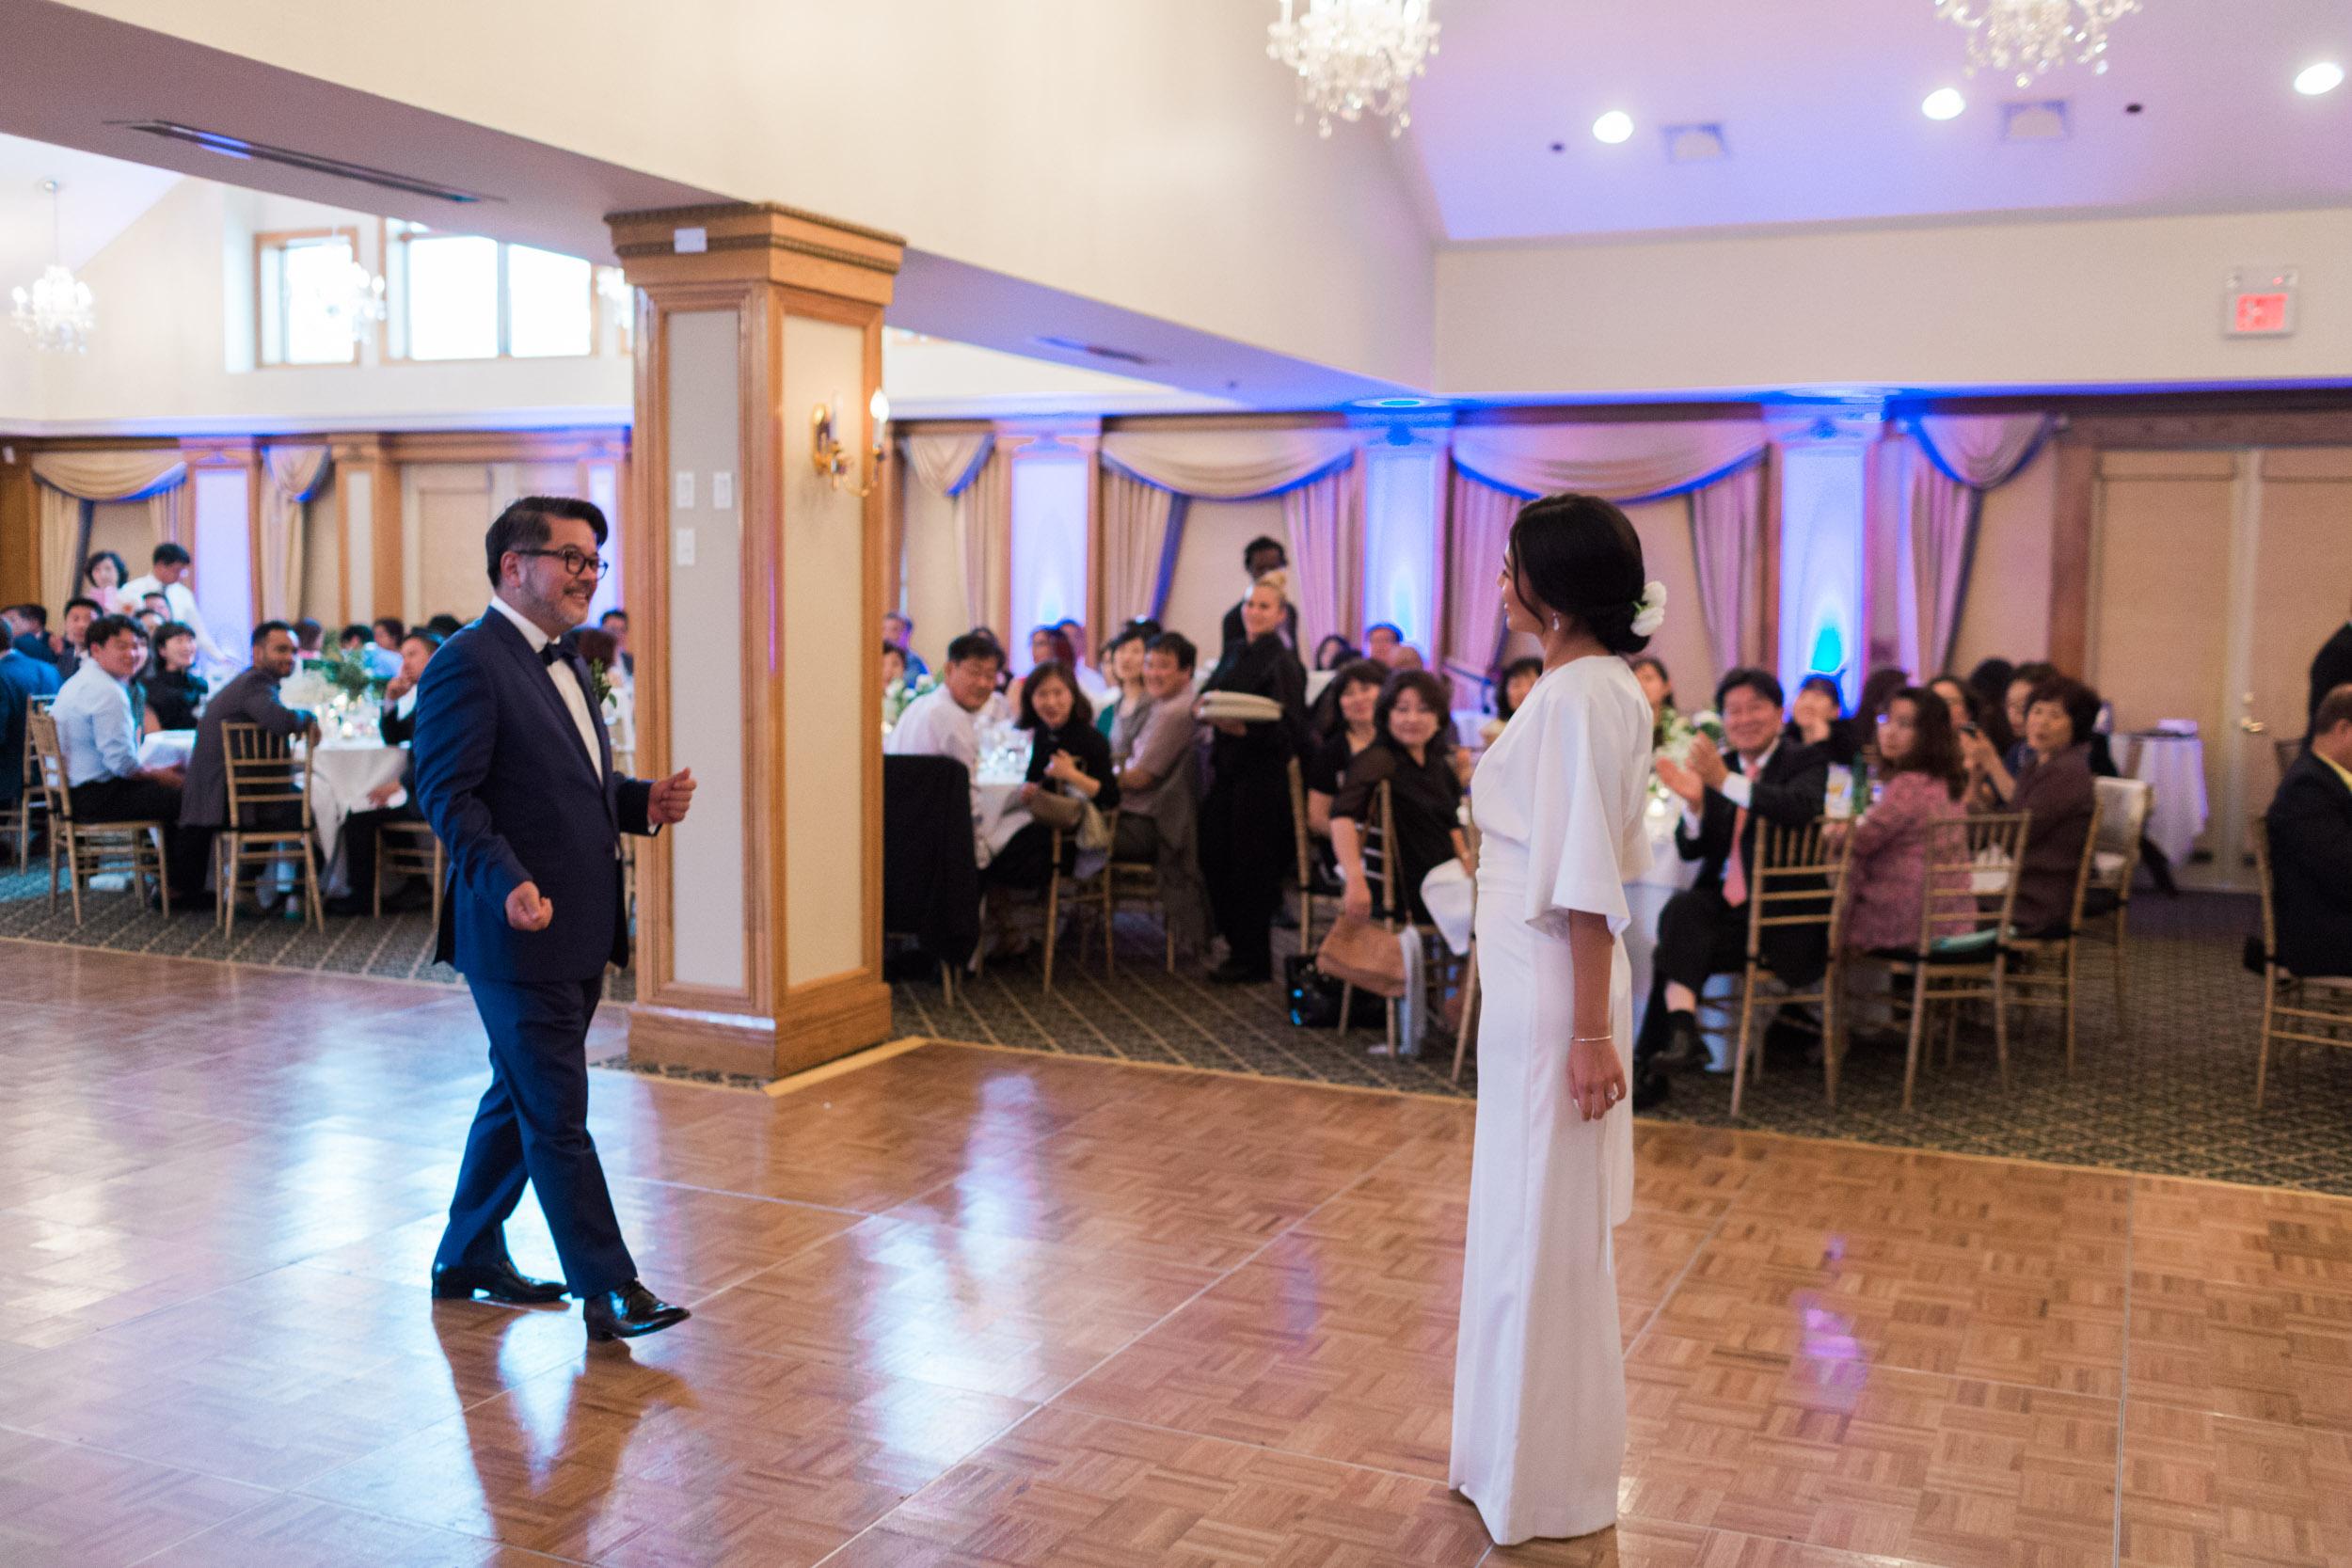 jean-arnold-wedding-0042.jpg